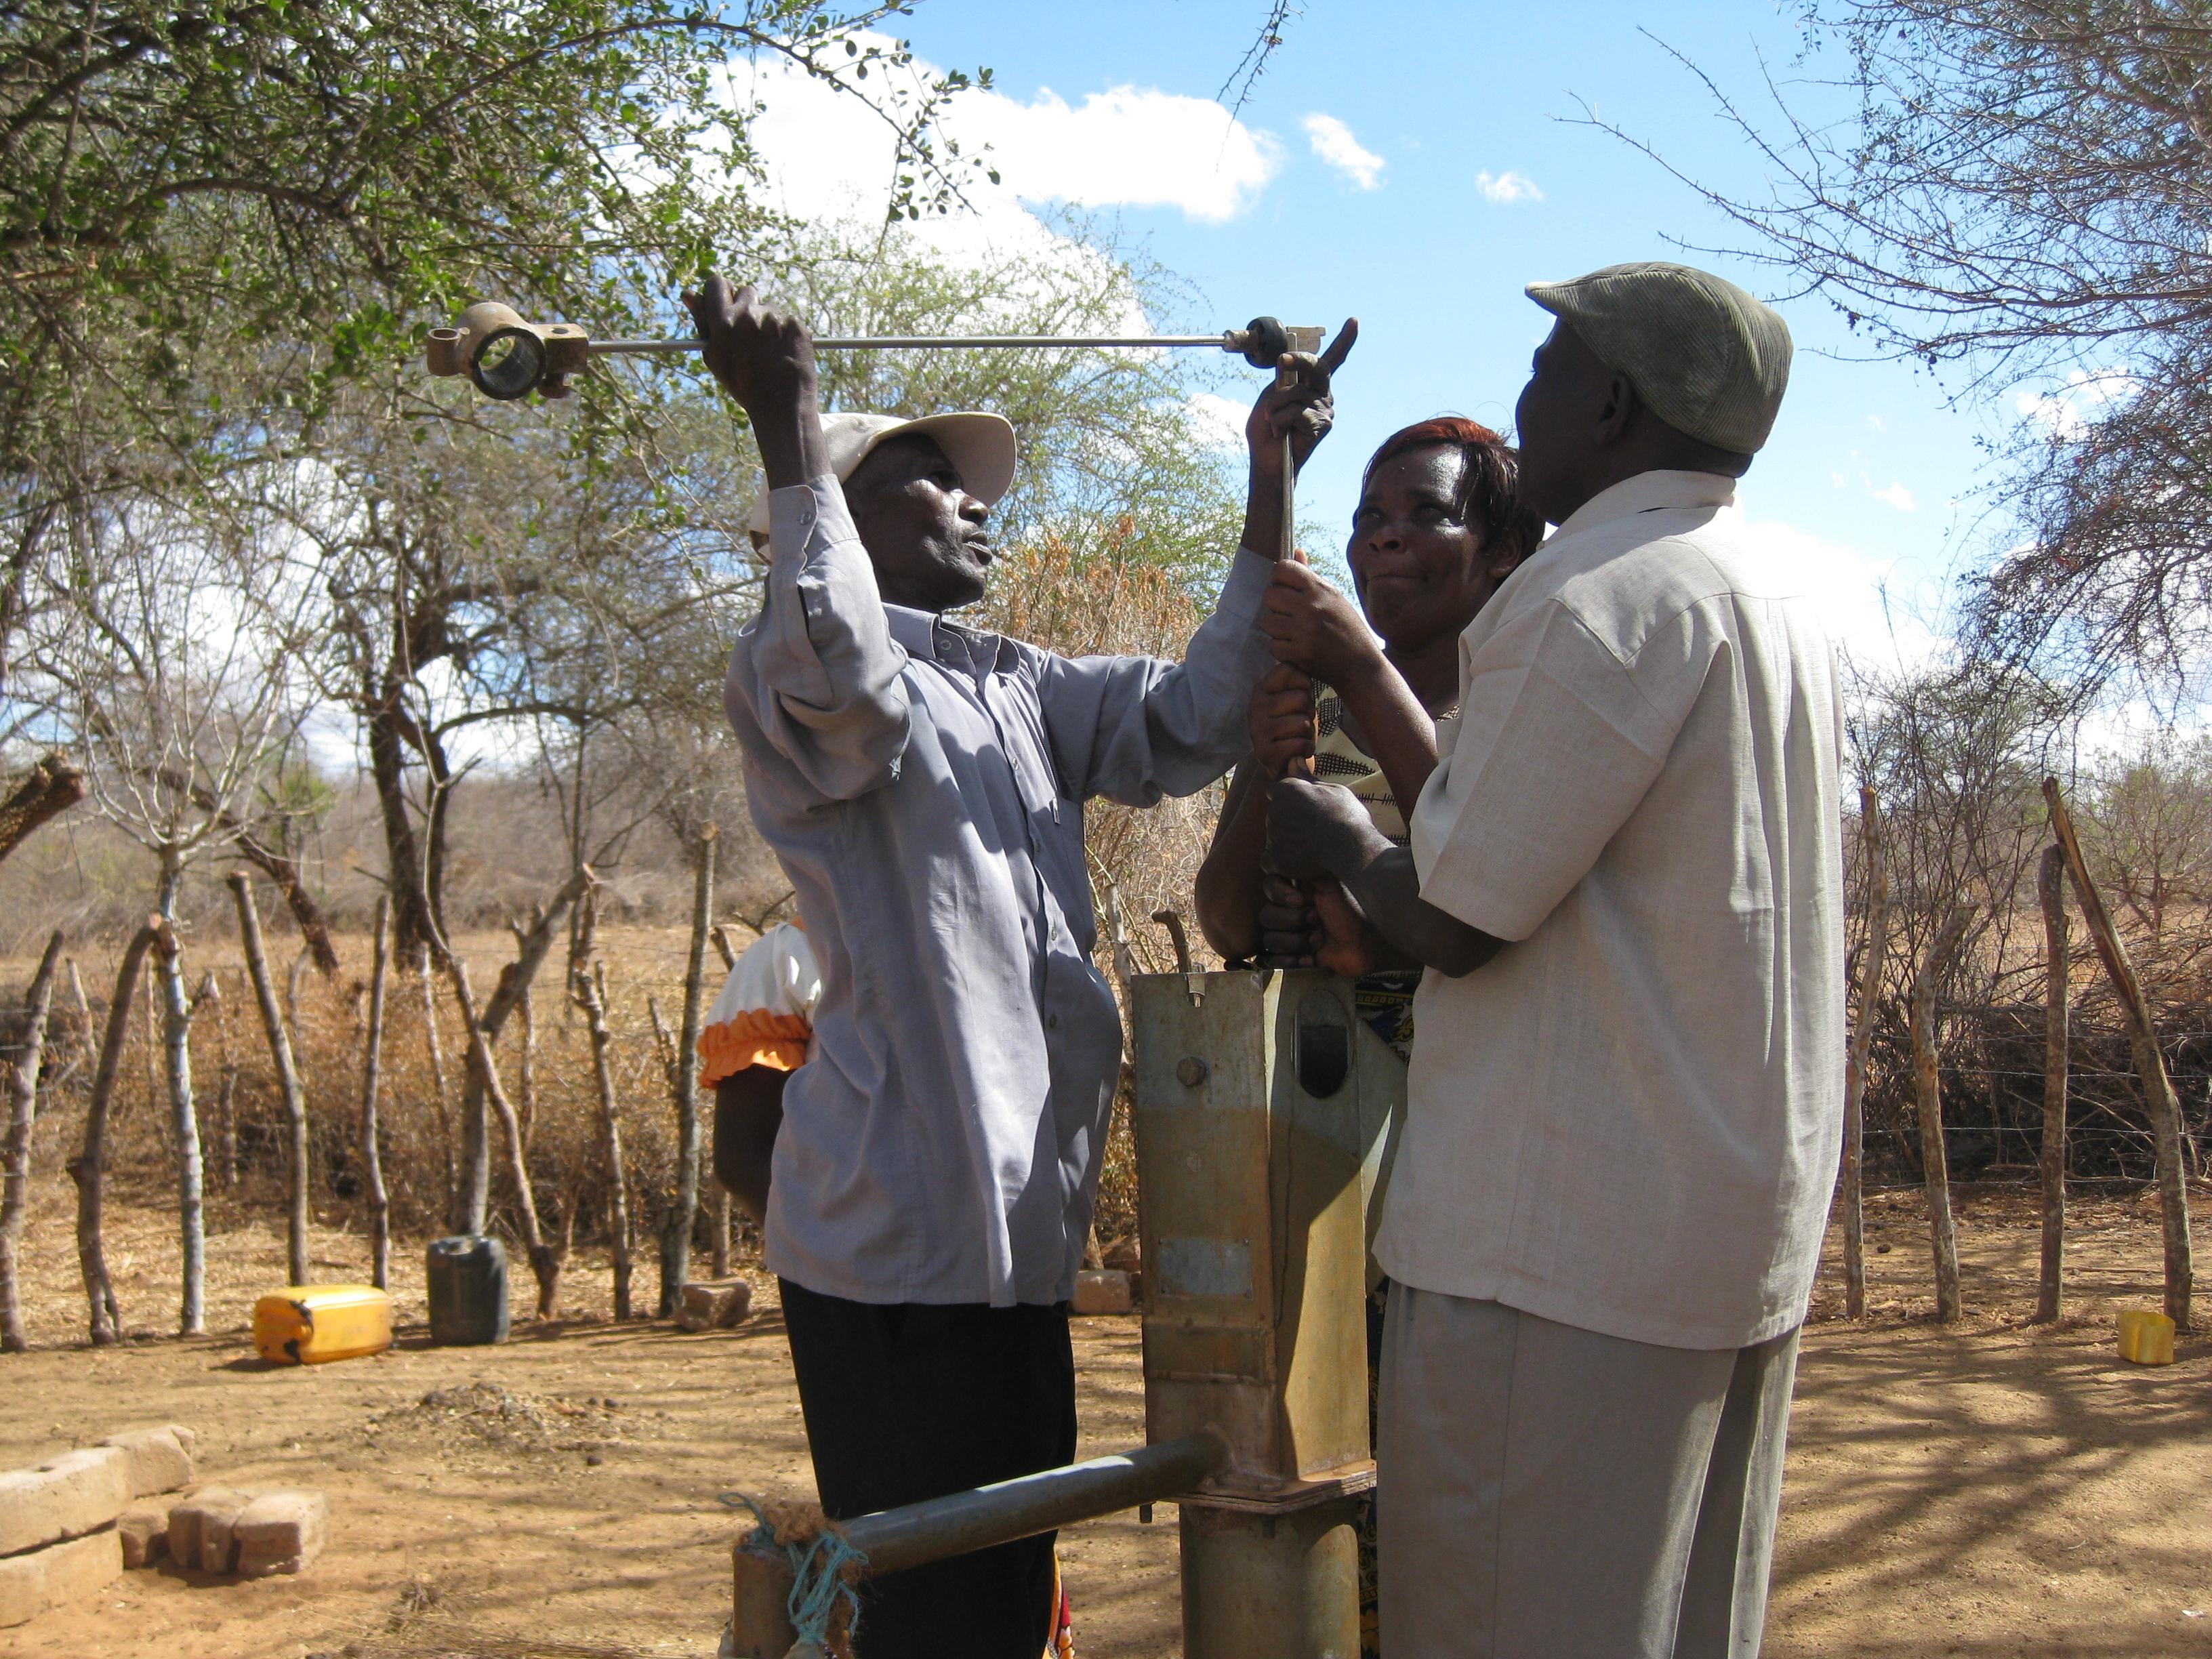 Mwaniki fixing a pump